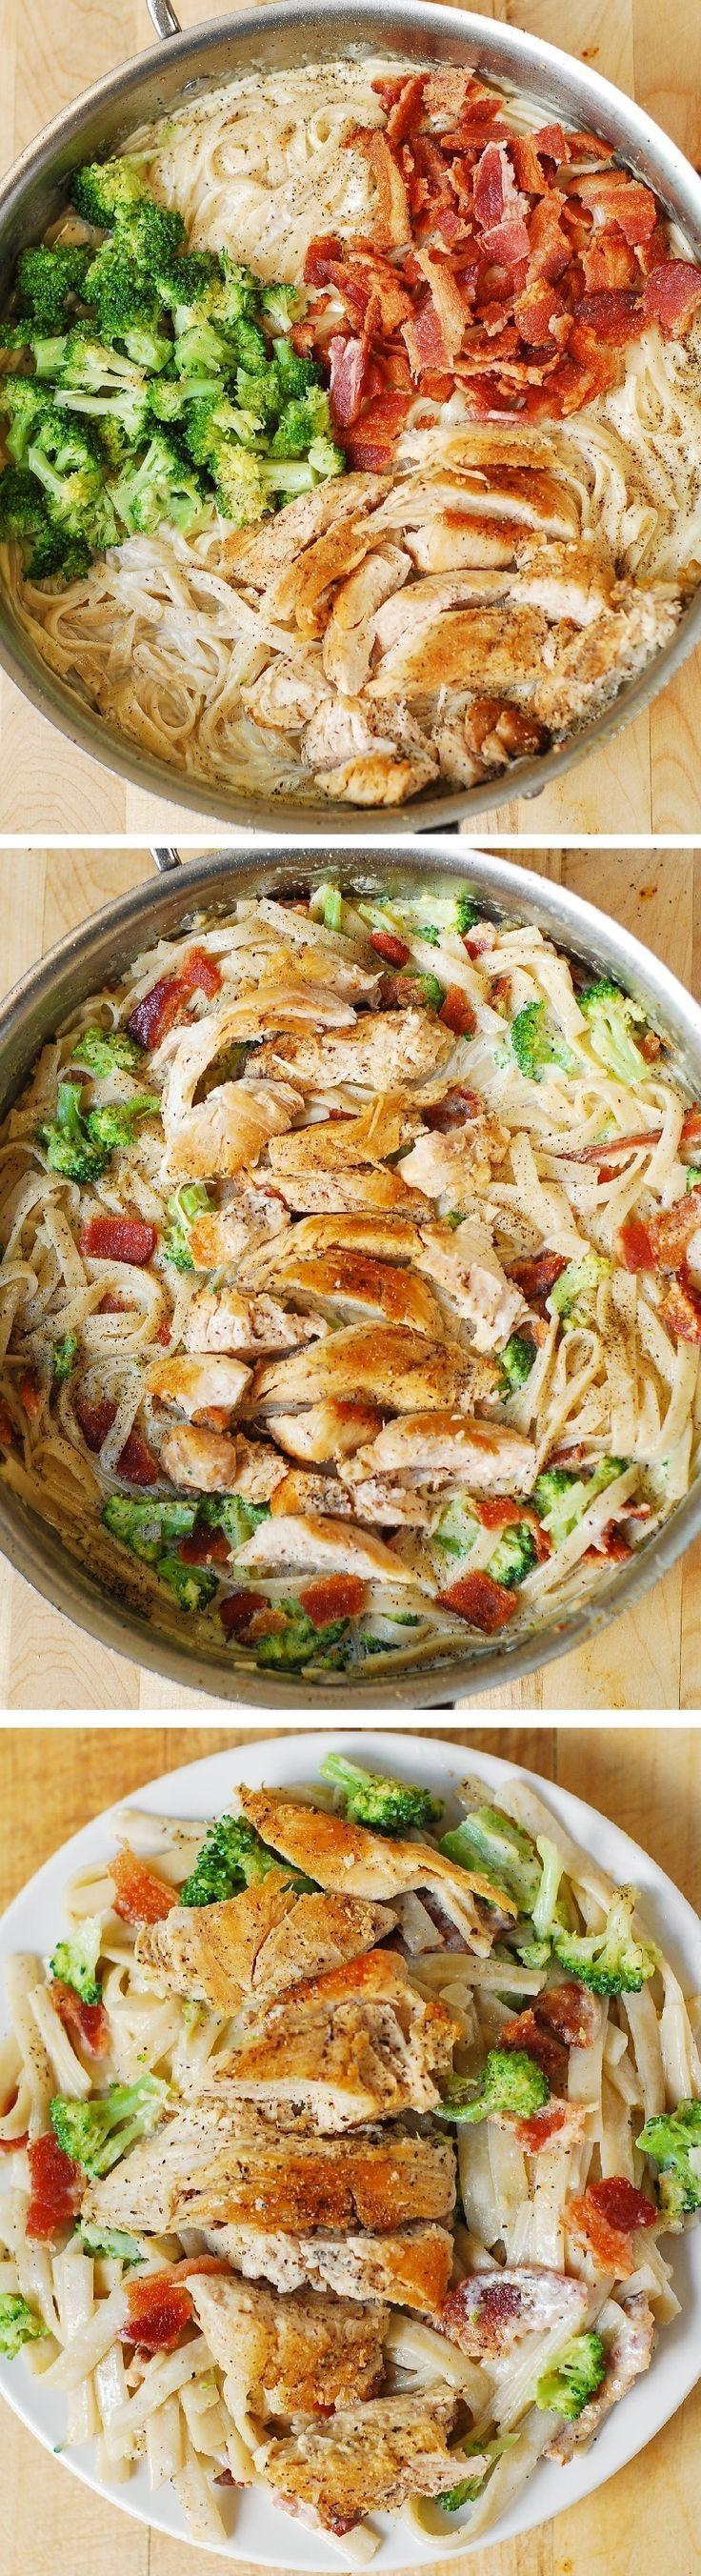 Chicken Broccoli Pasta with Bacon